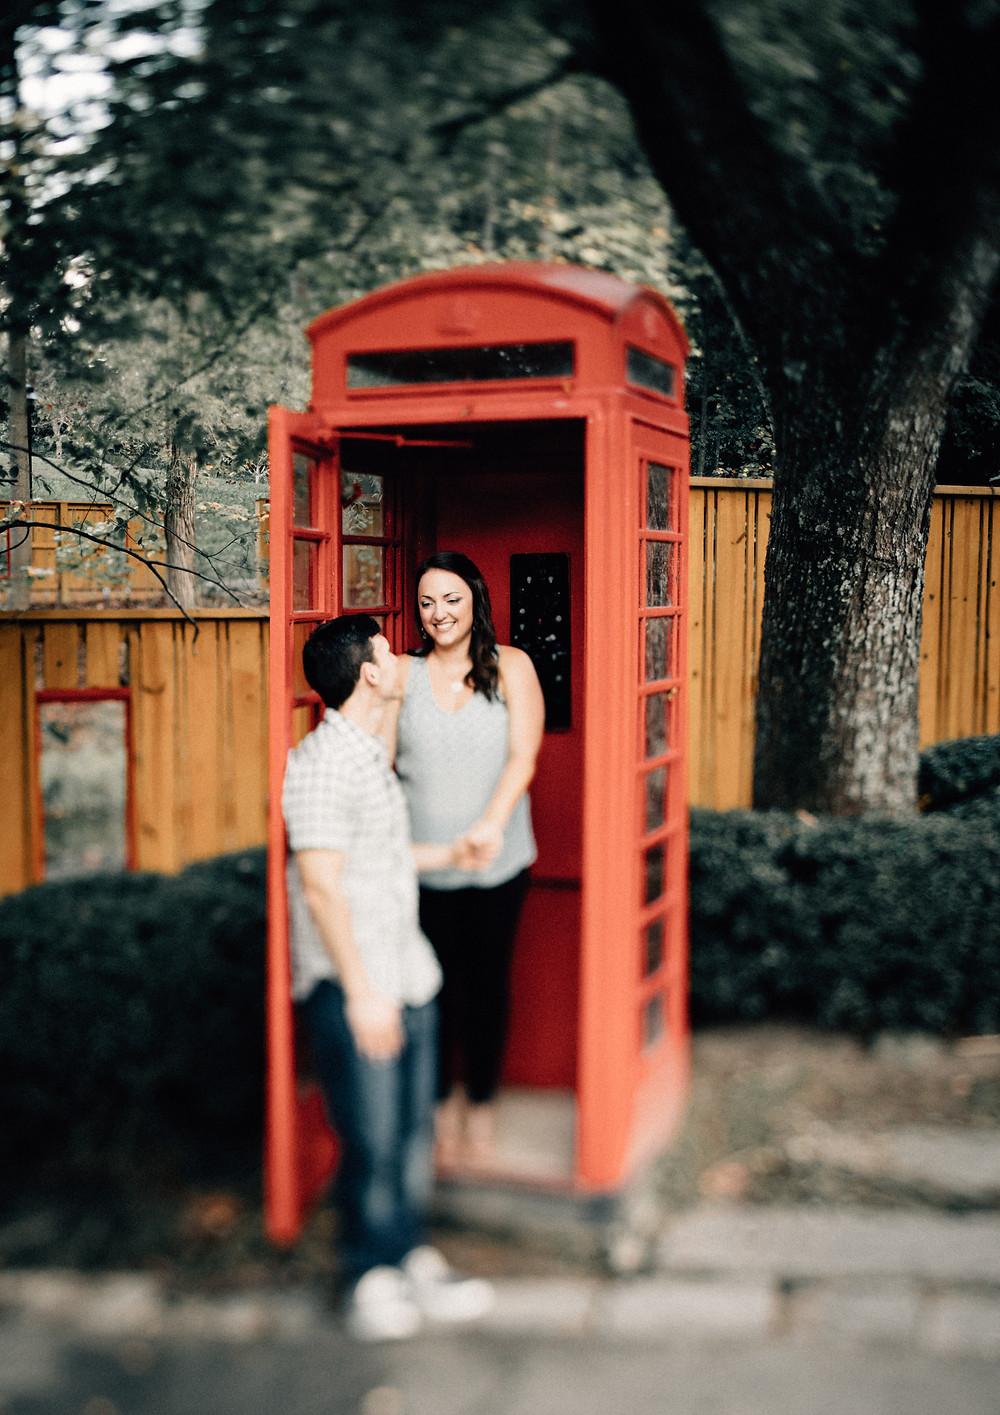 Atlanta engagement session locations